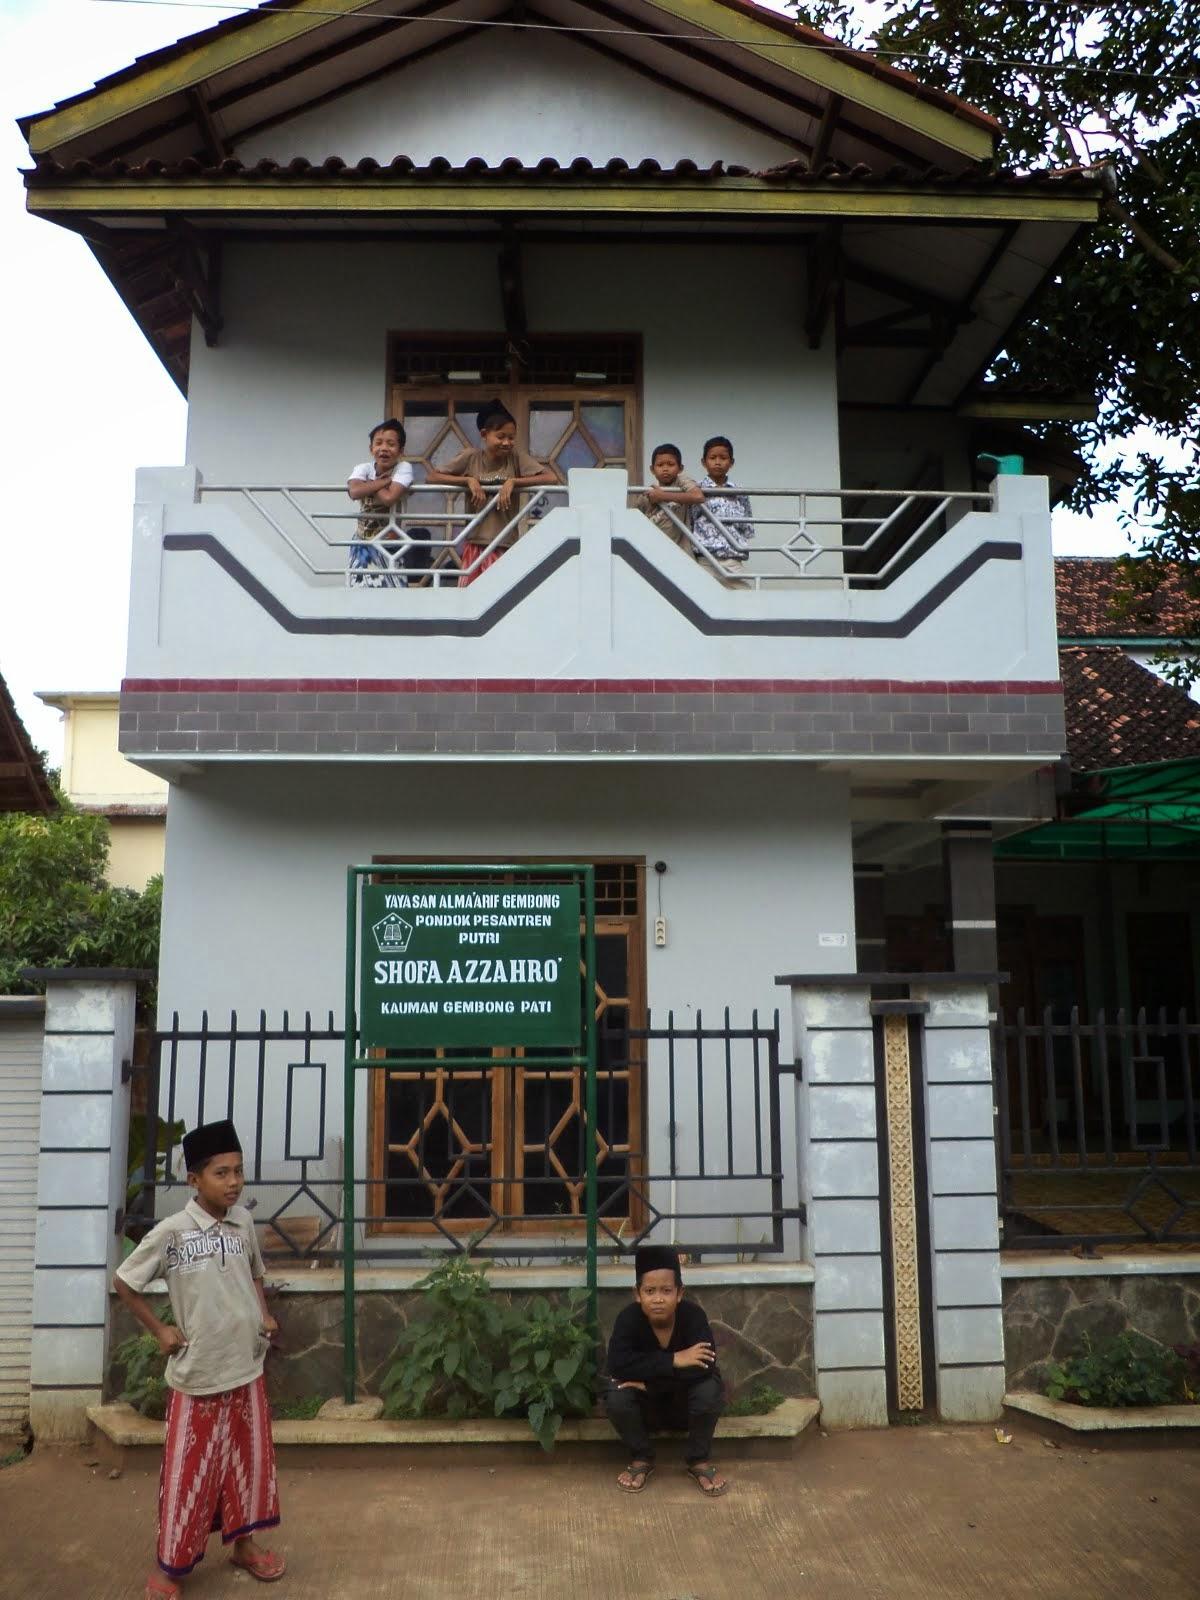 Gedung Ponpes II